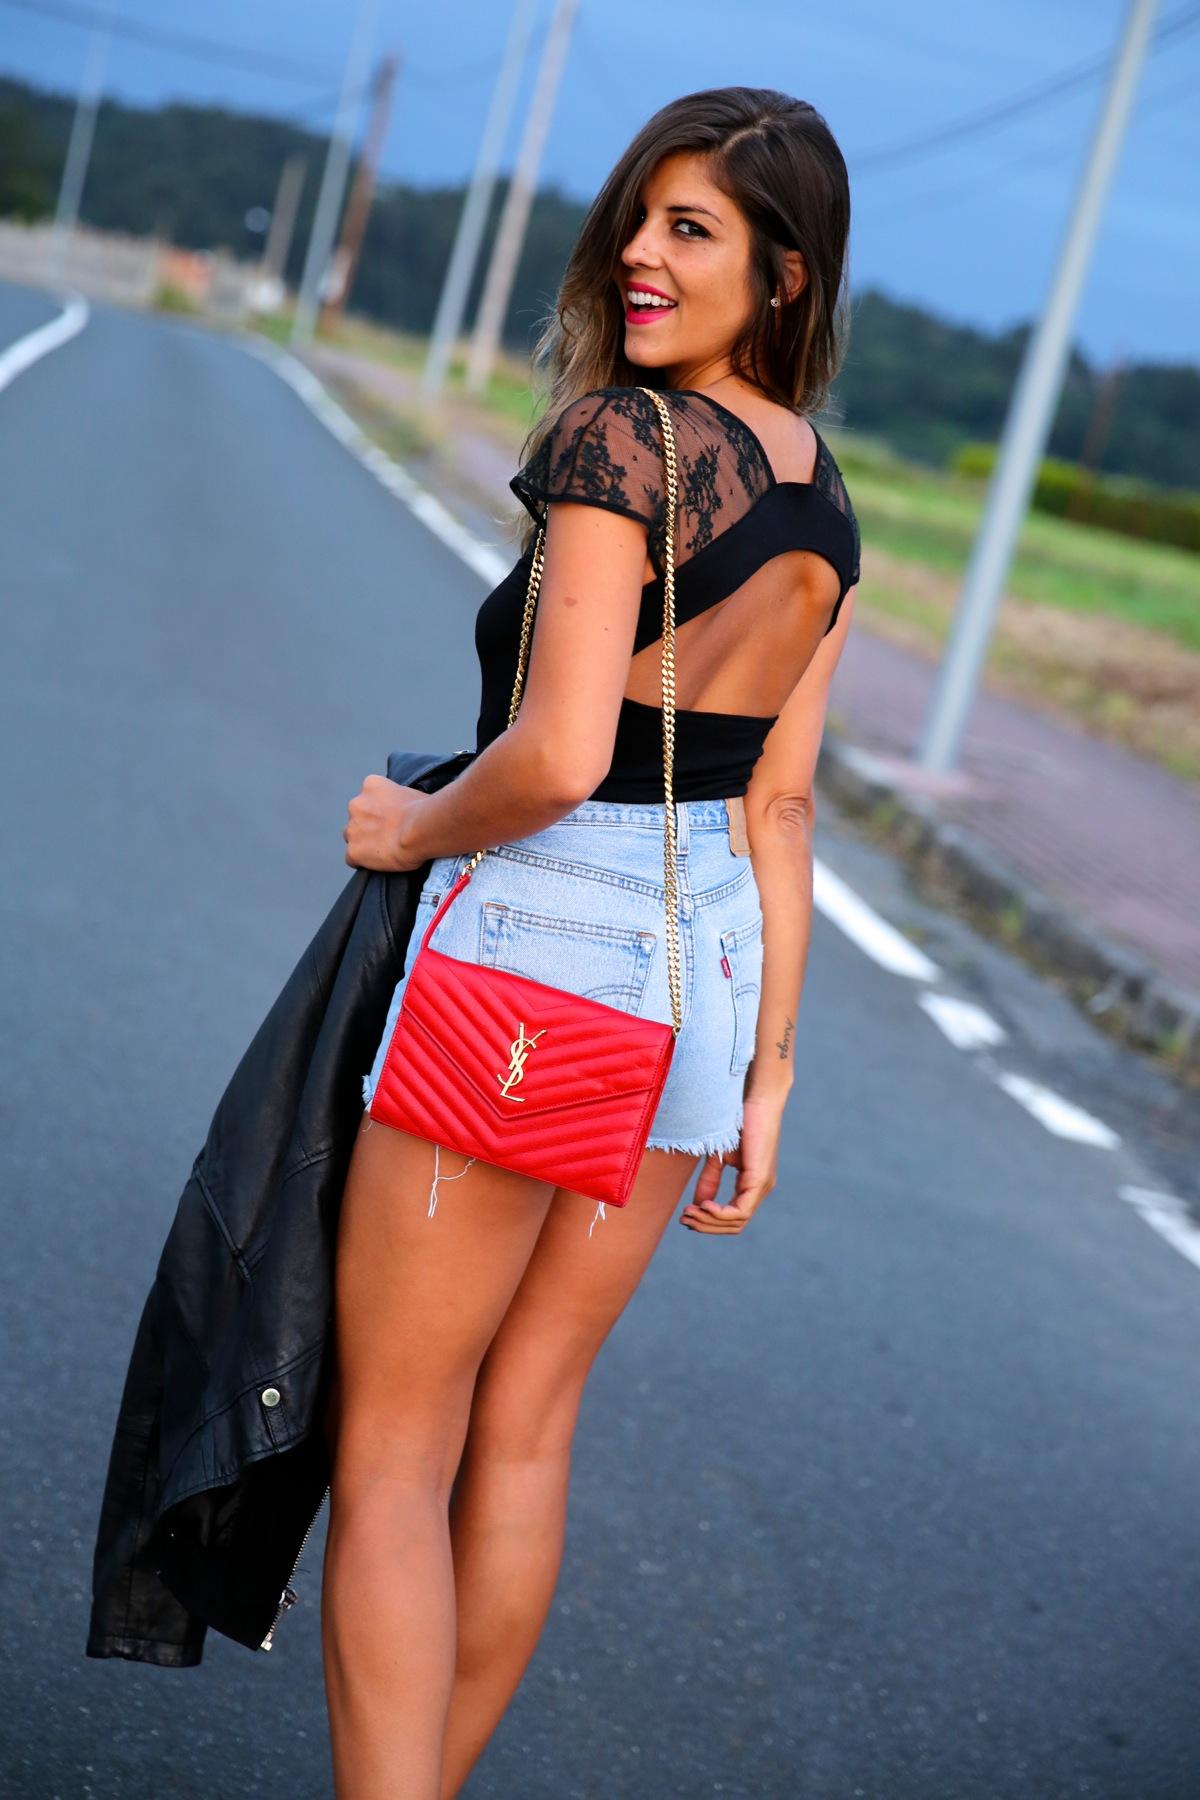 trendy_taste-look-outfit-street_style-ootd-blog-blogger-fashion_spain-moda_españa-denim_shorts-shorts_vaqueros-chaqueta_cuero-leather_jacket-ysl-saint_laurent-5